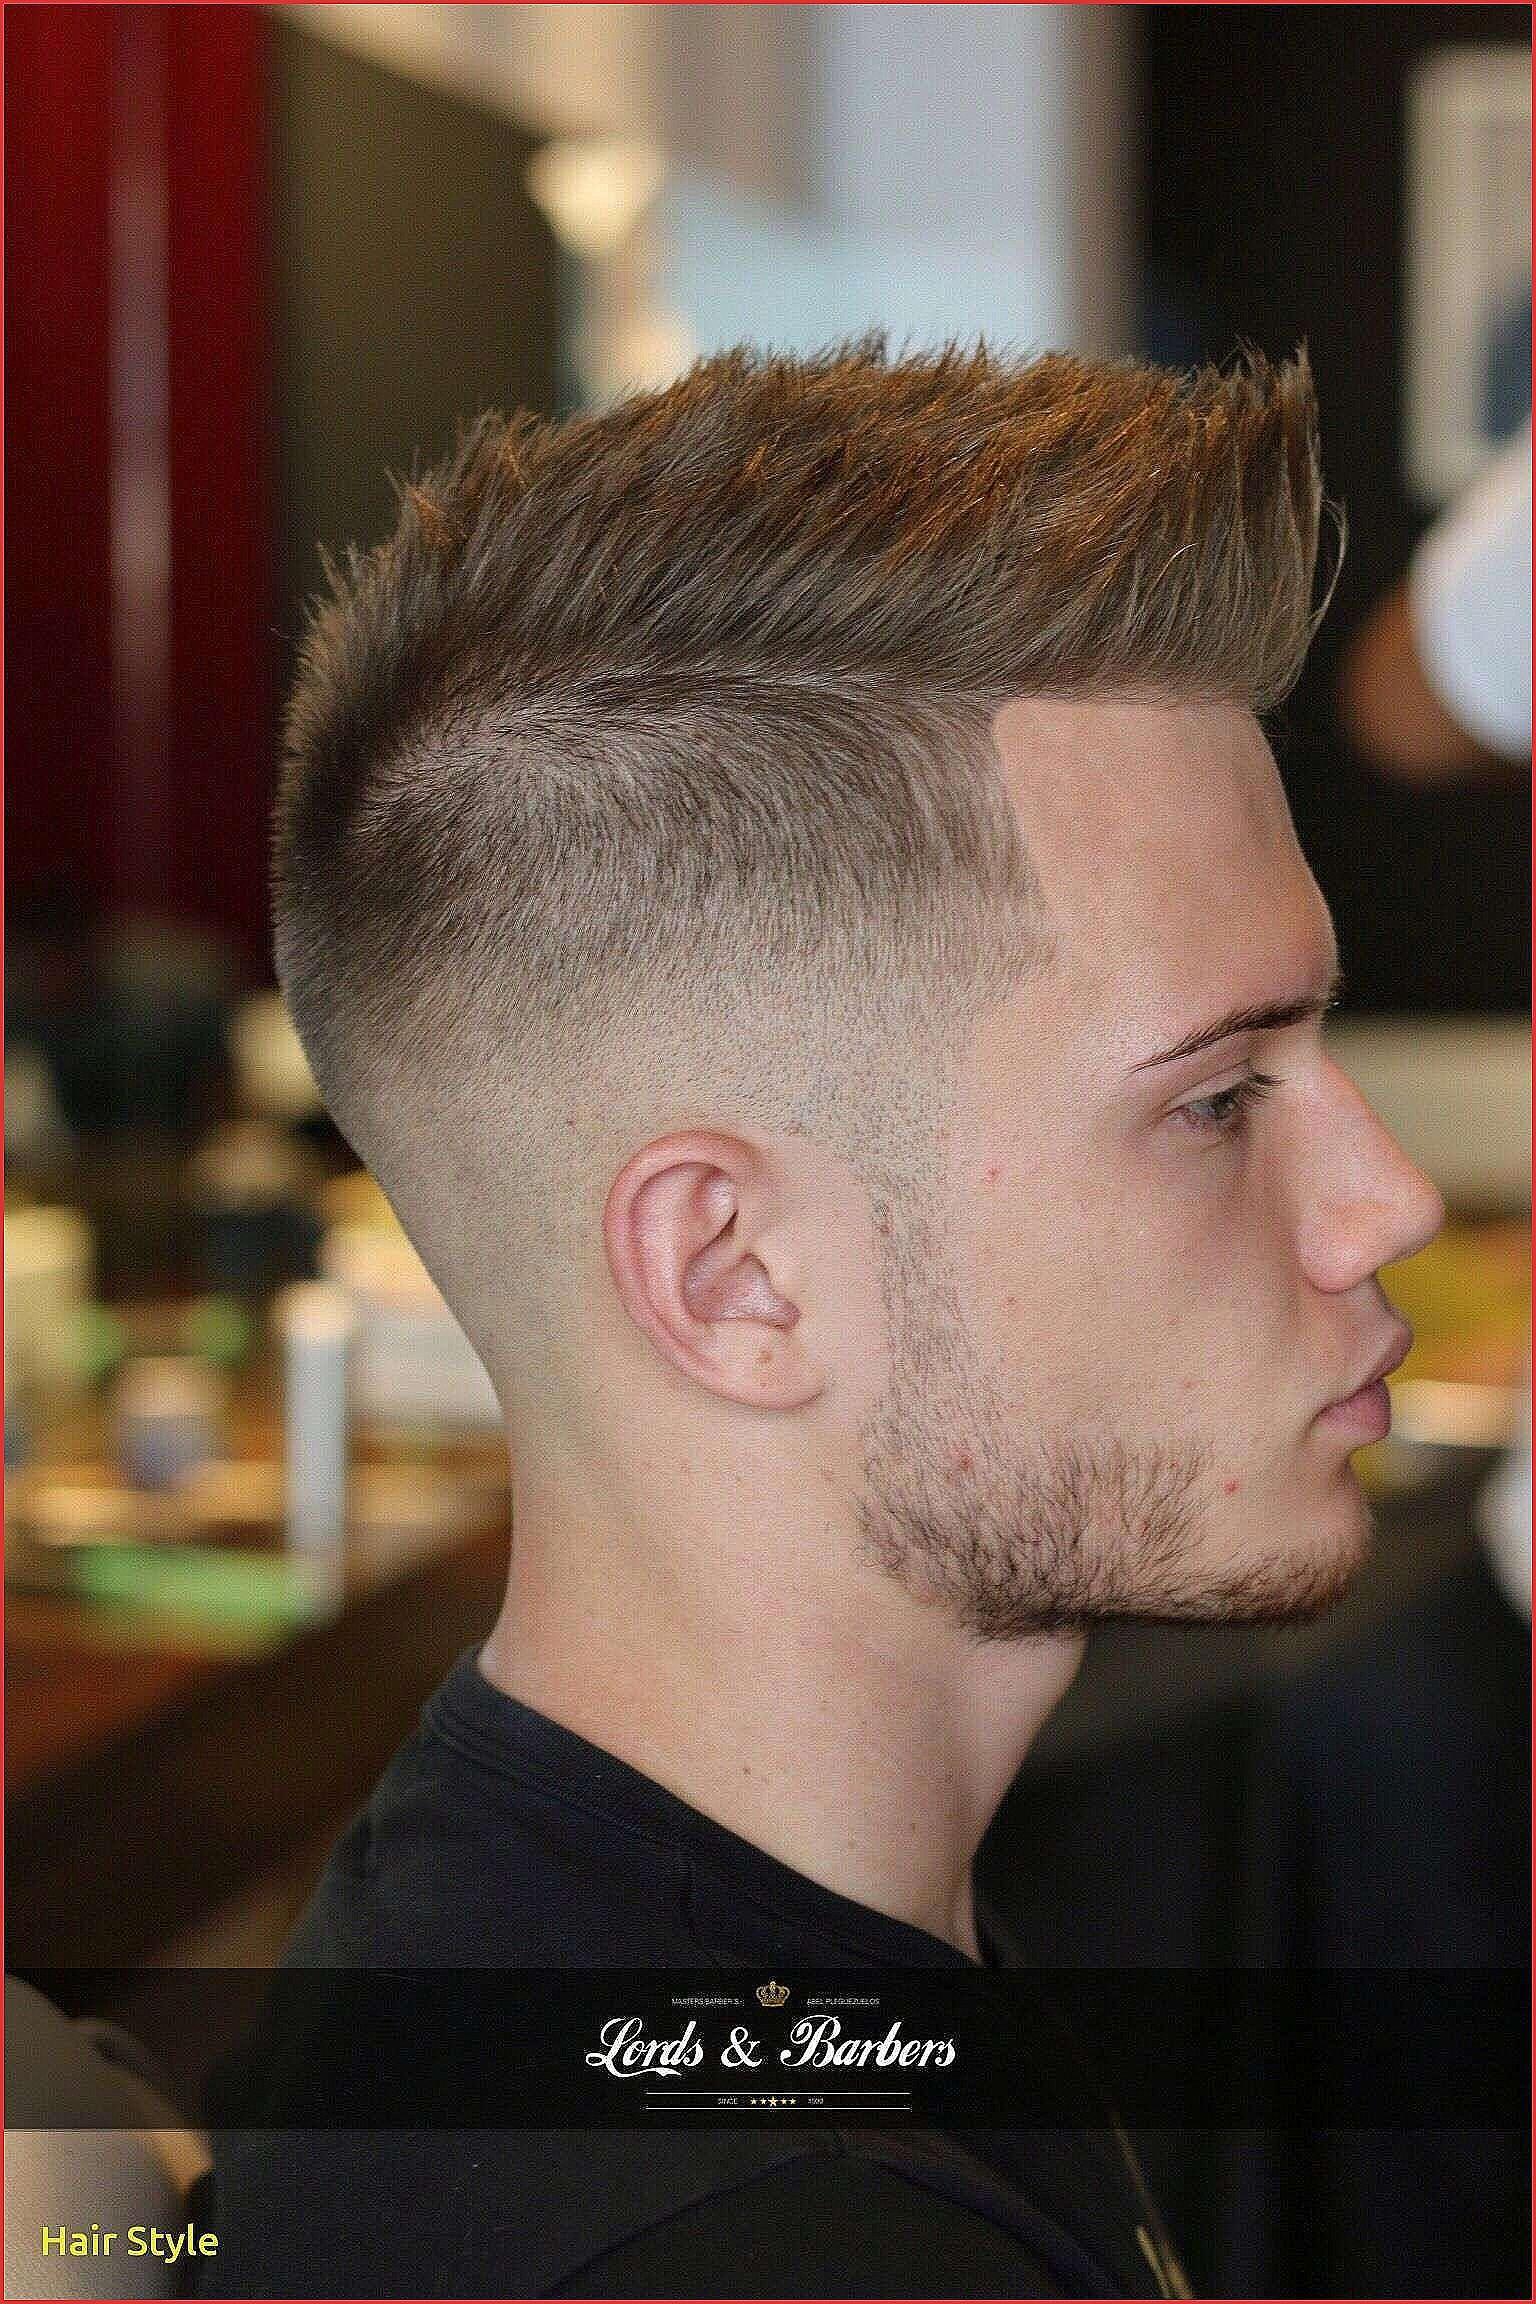 Beautiful Top Ten Hairstyles Check More At Https Thegreenmagazine Com Top Ten Hairstyles Gentleman Haircut Mens Haircuts Short Mens Hairstyles